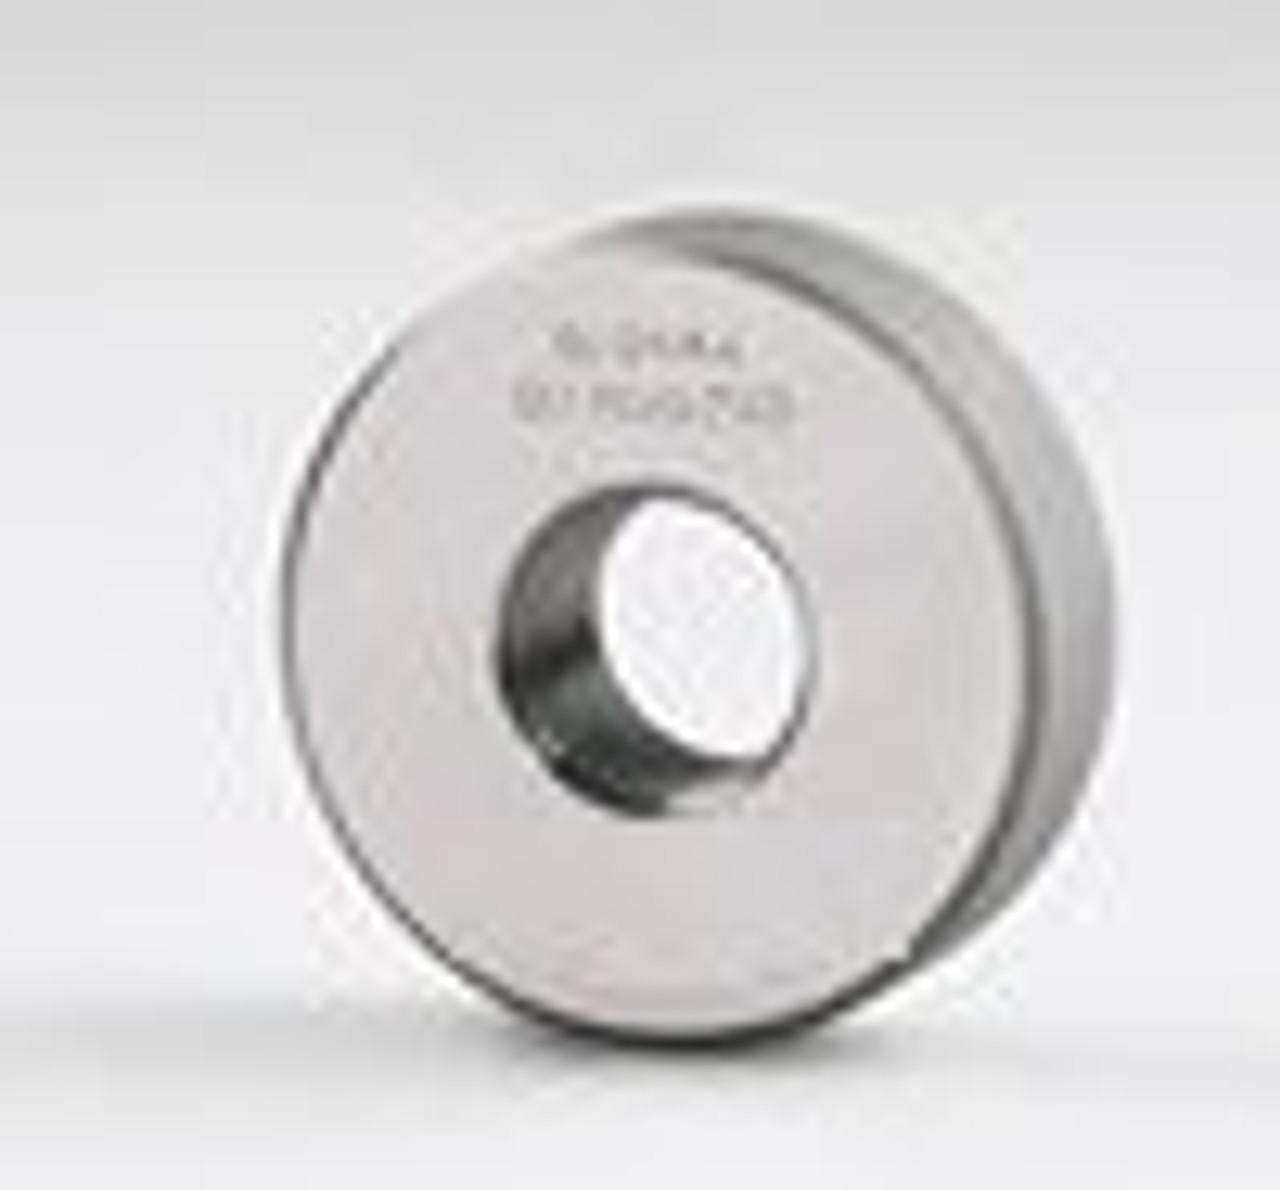 "BSW 1-1/4"" - 7 GO Thread Ring Gauge - (BSW1-1/4RG-GO)"